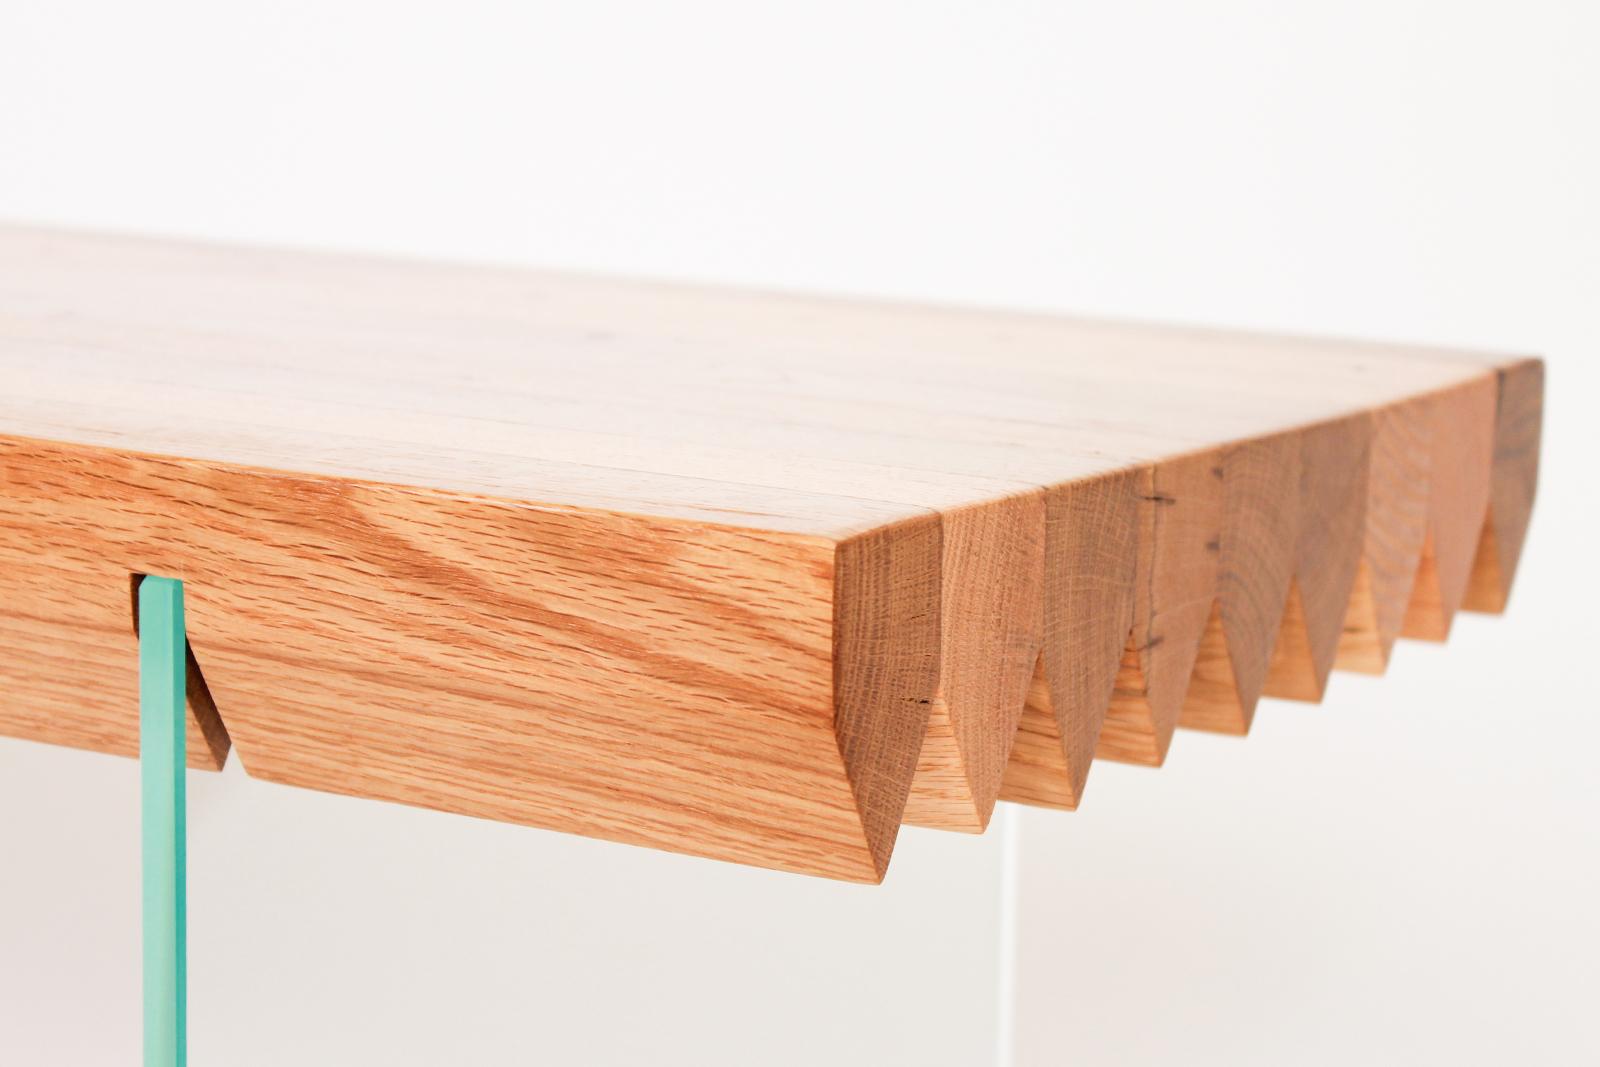 durodeco_Sawtooth Bench (4).jpg